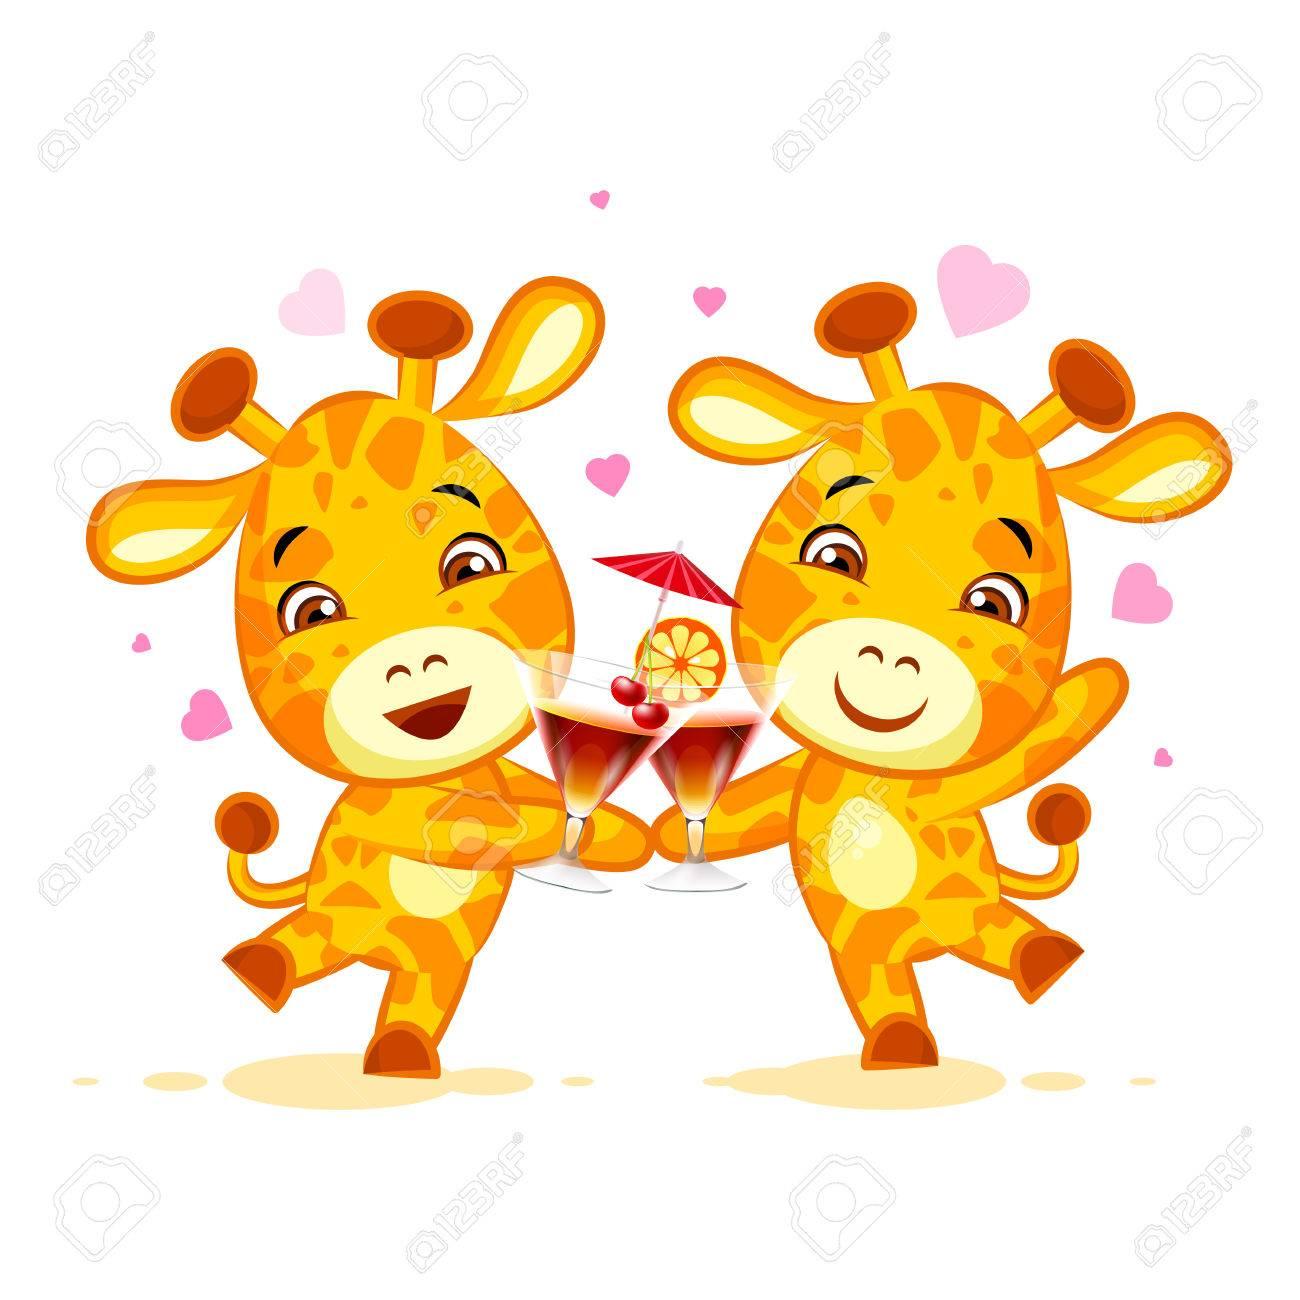 Emoji let have drink party character cartoon friends Giraffe